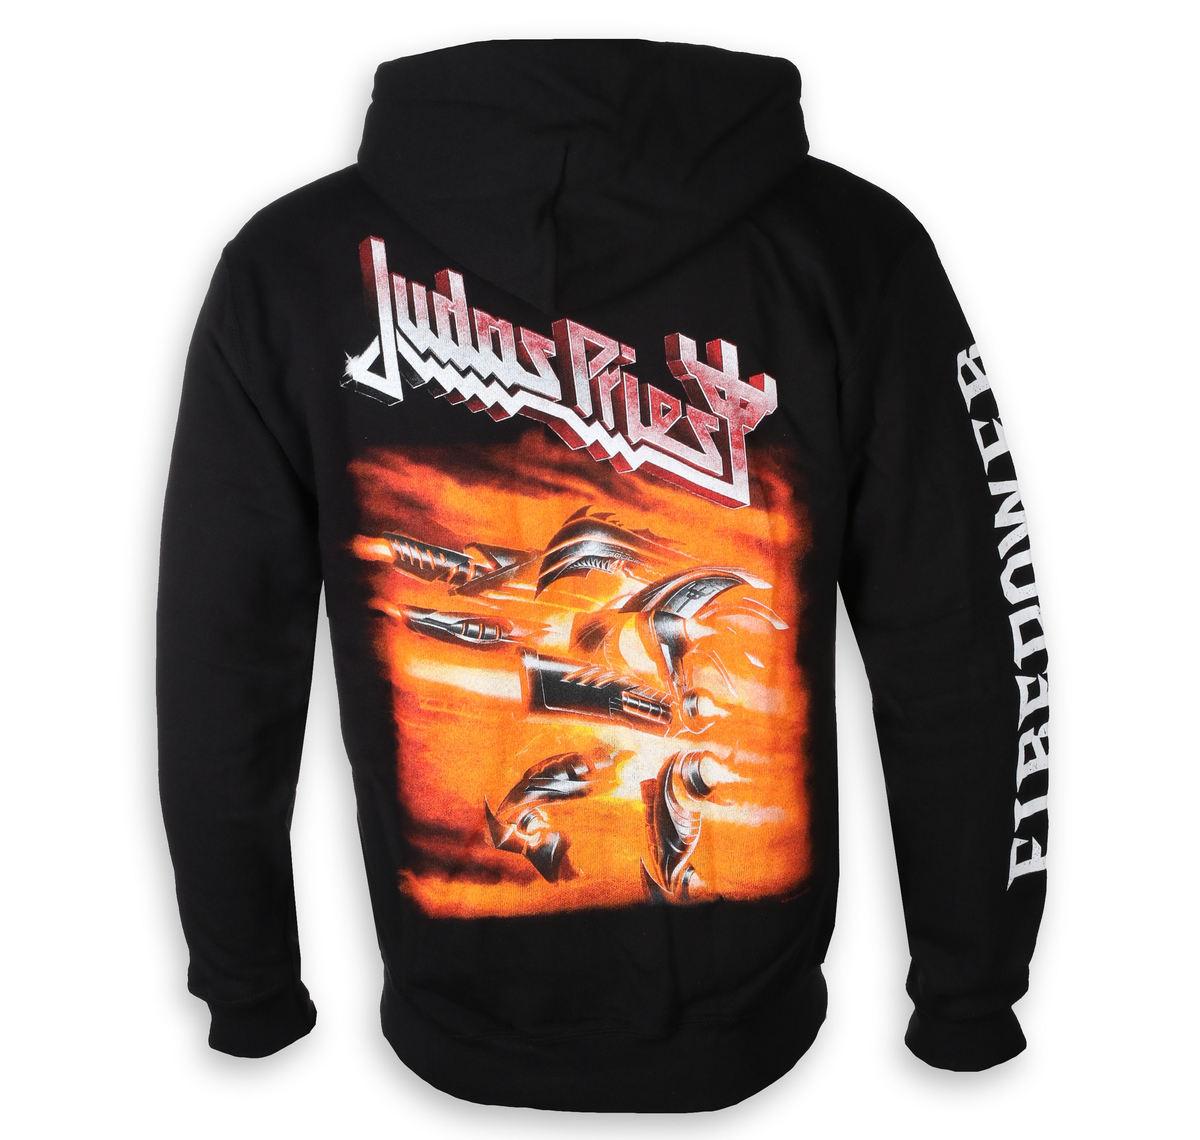 NEW /& OFFICIAL! Judas Priest /'Firepower/' Zip Up Hoodie